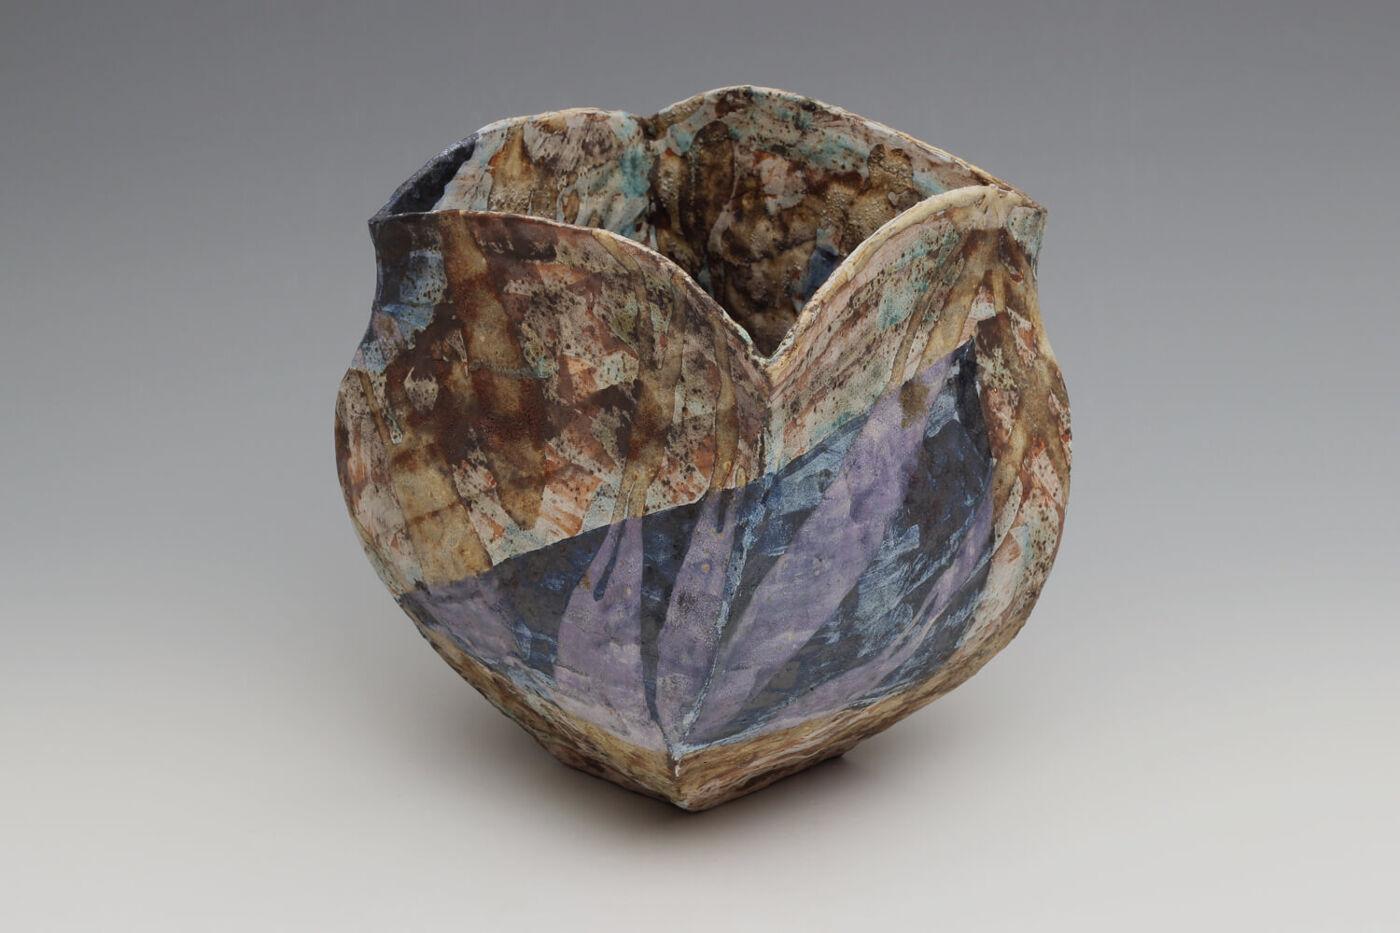 Julian King-Salter Ceramic Vessel 01